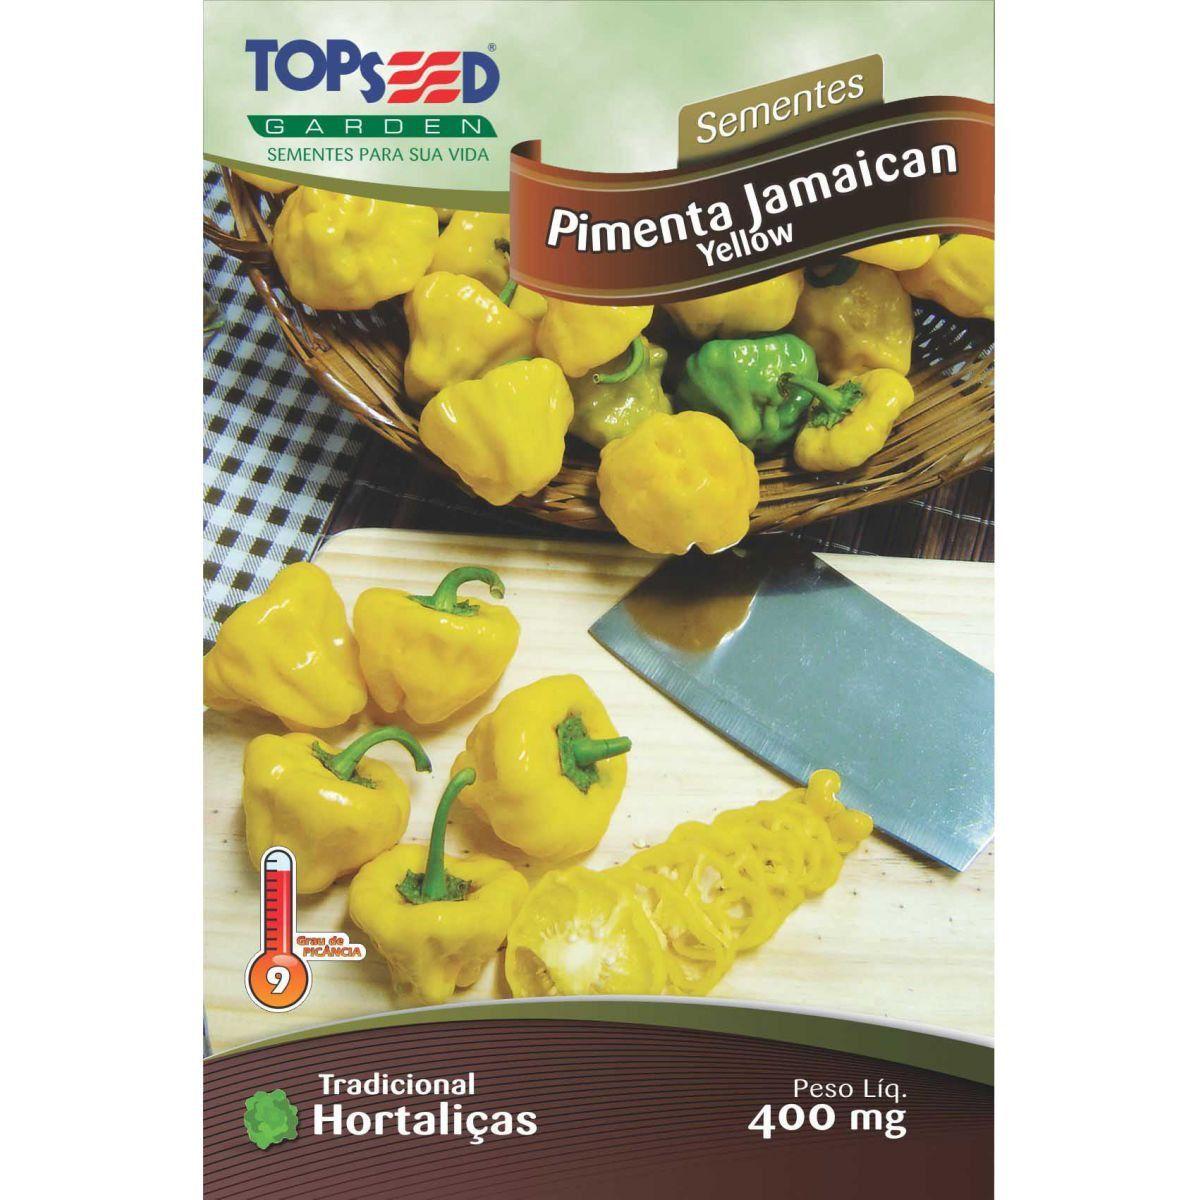 Sementes de Pimenta Jamaican Yellow - Topseed Linha Tradicional